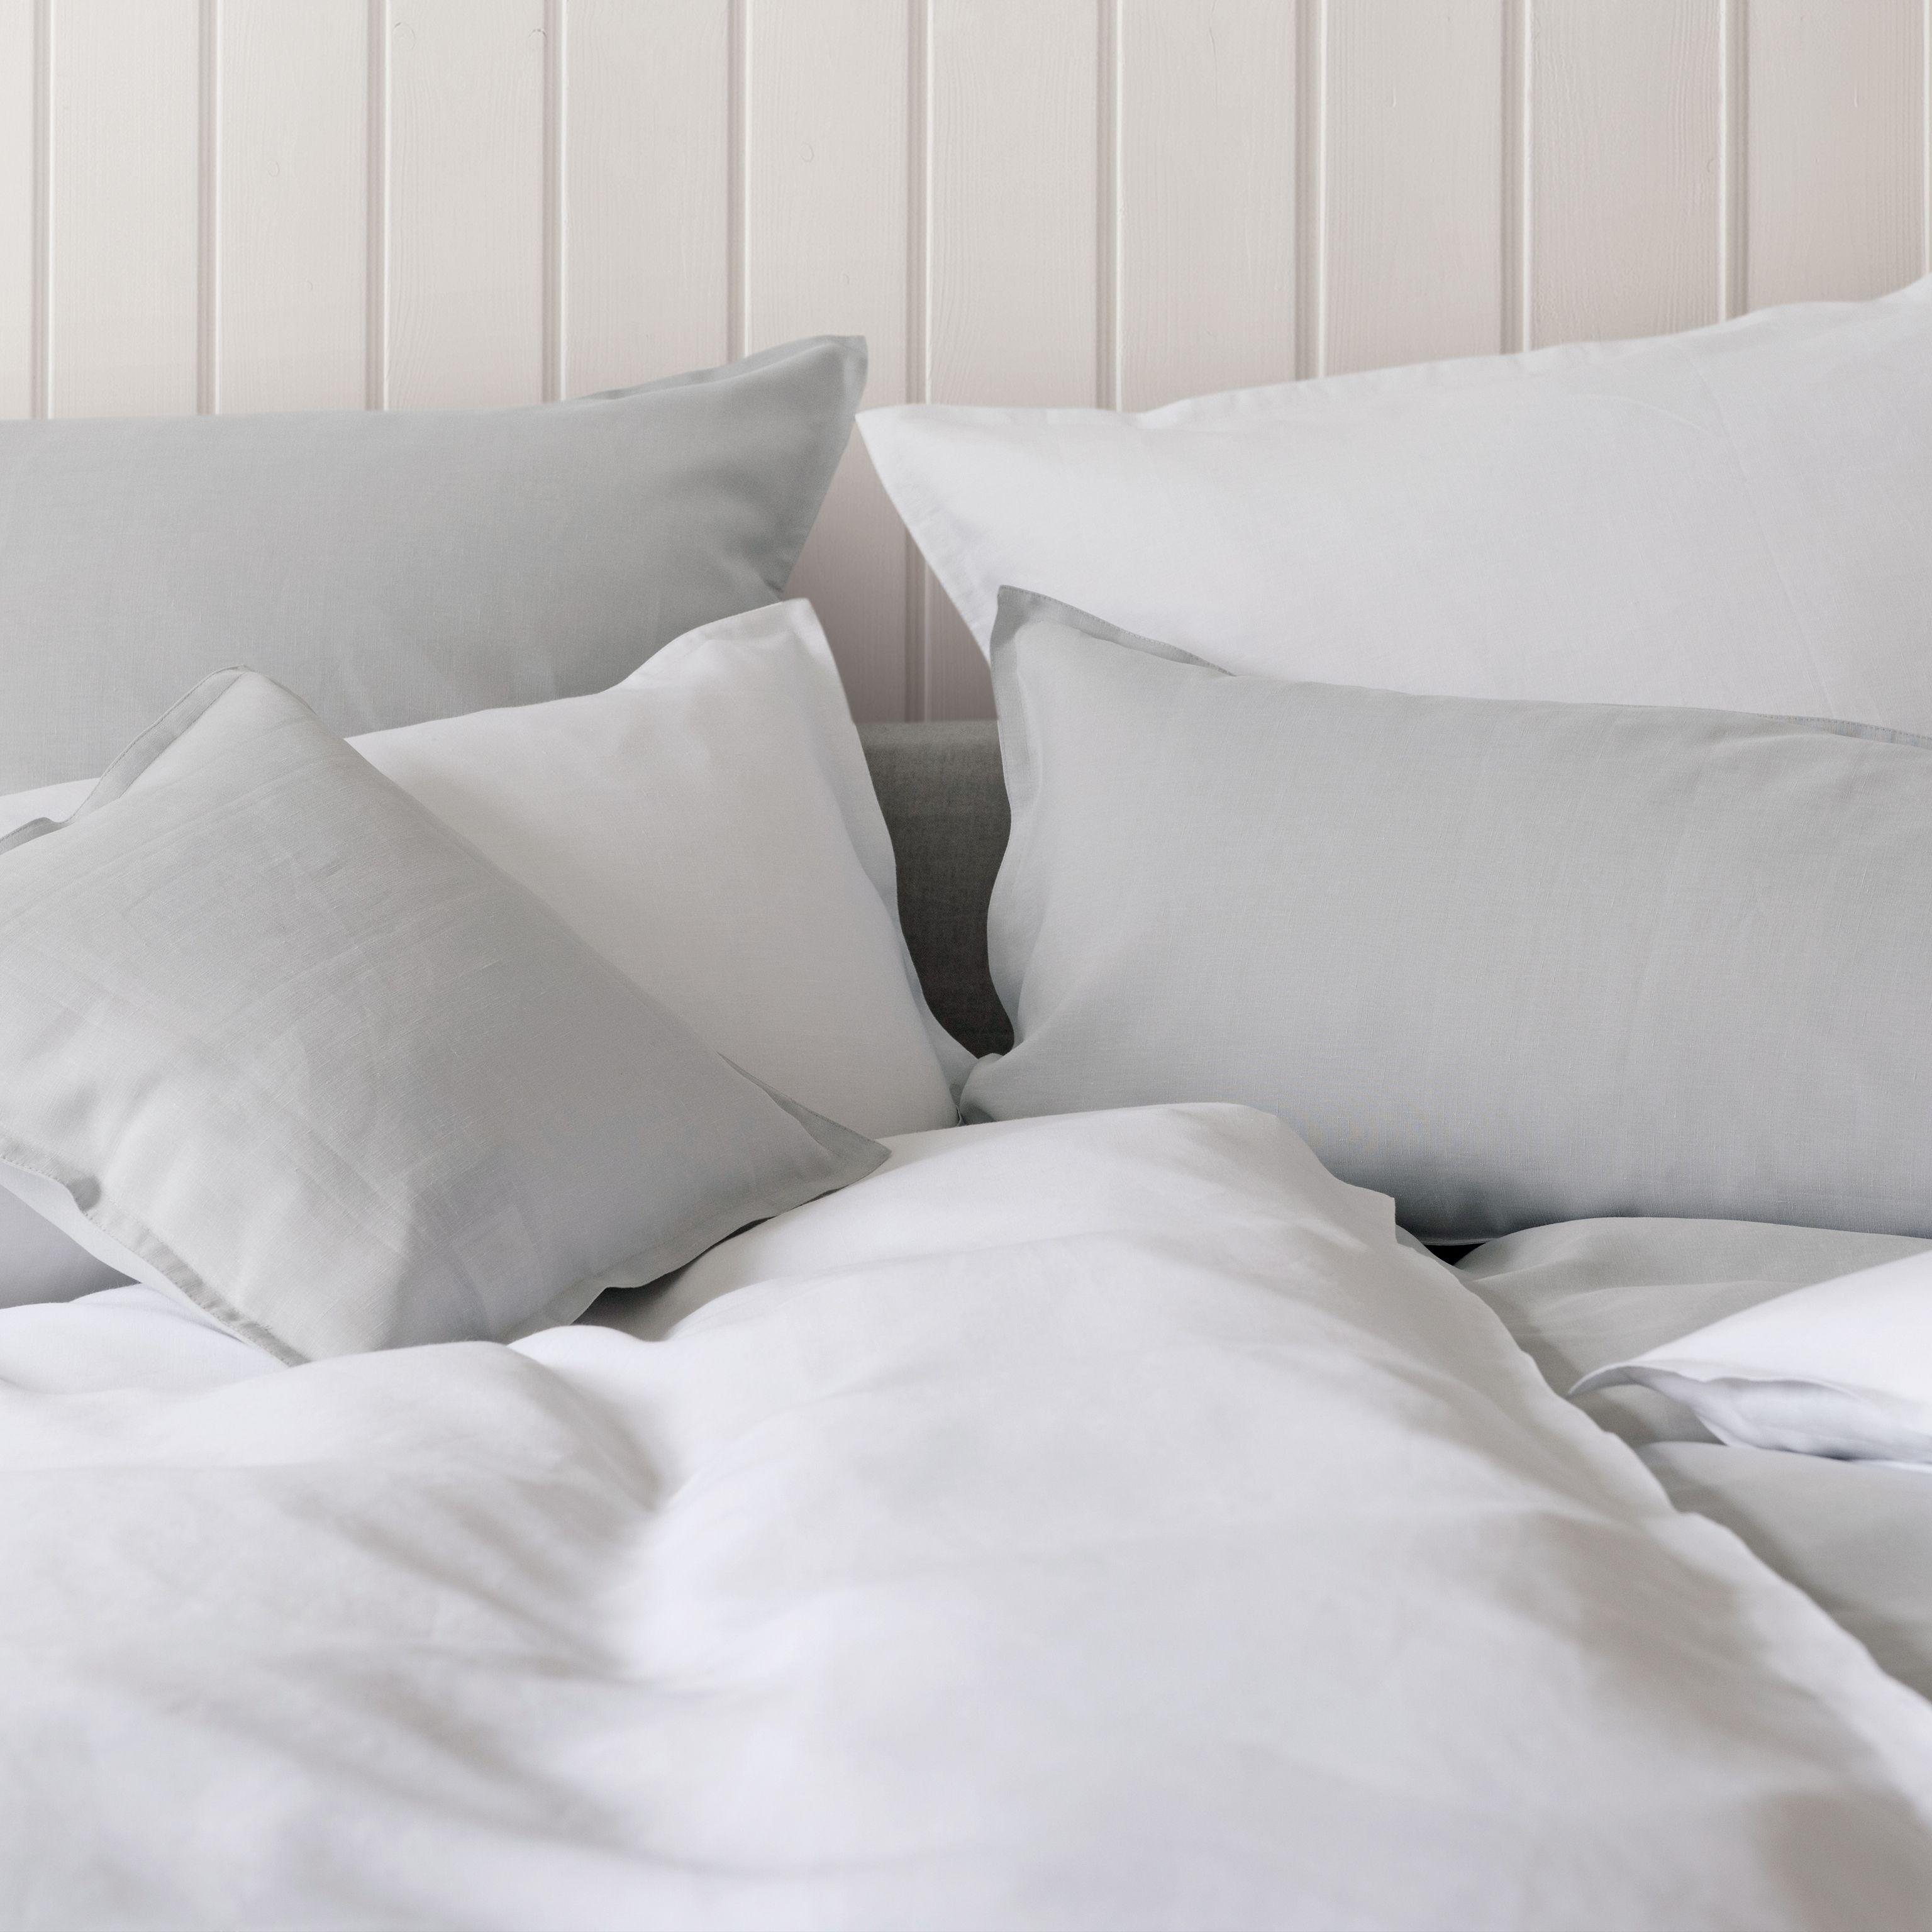 bettwsche leinen grau cool designer leinen bettwsche. Black Bedroom Furniture Sets. Home Design Ideas